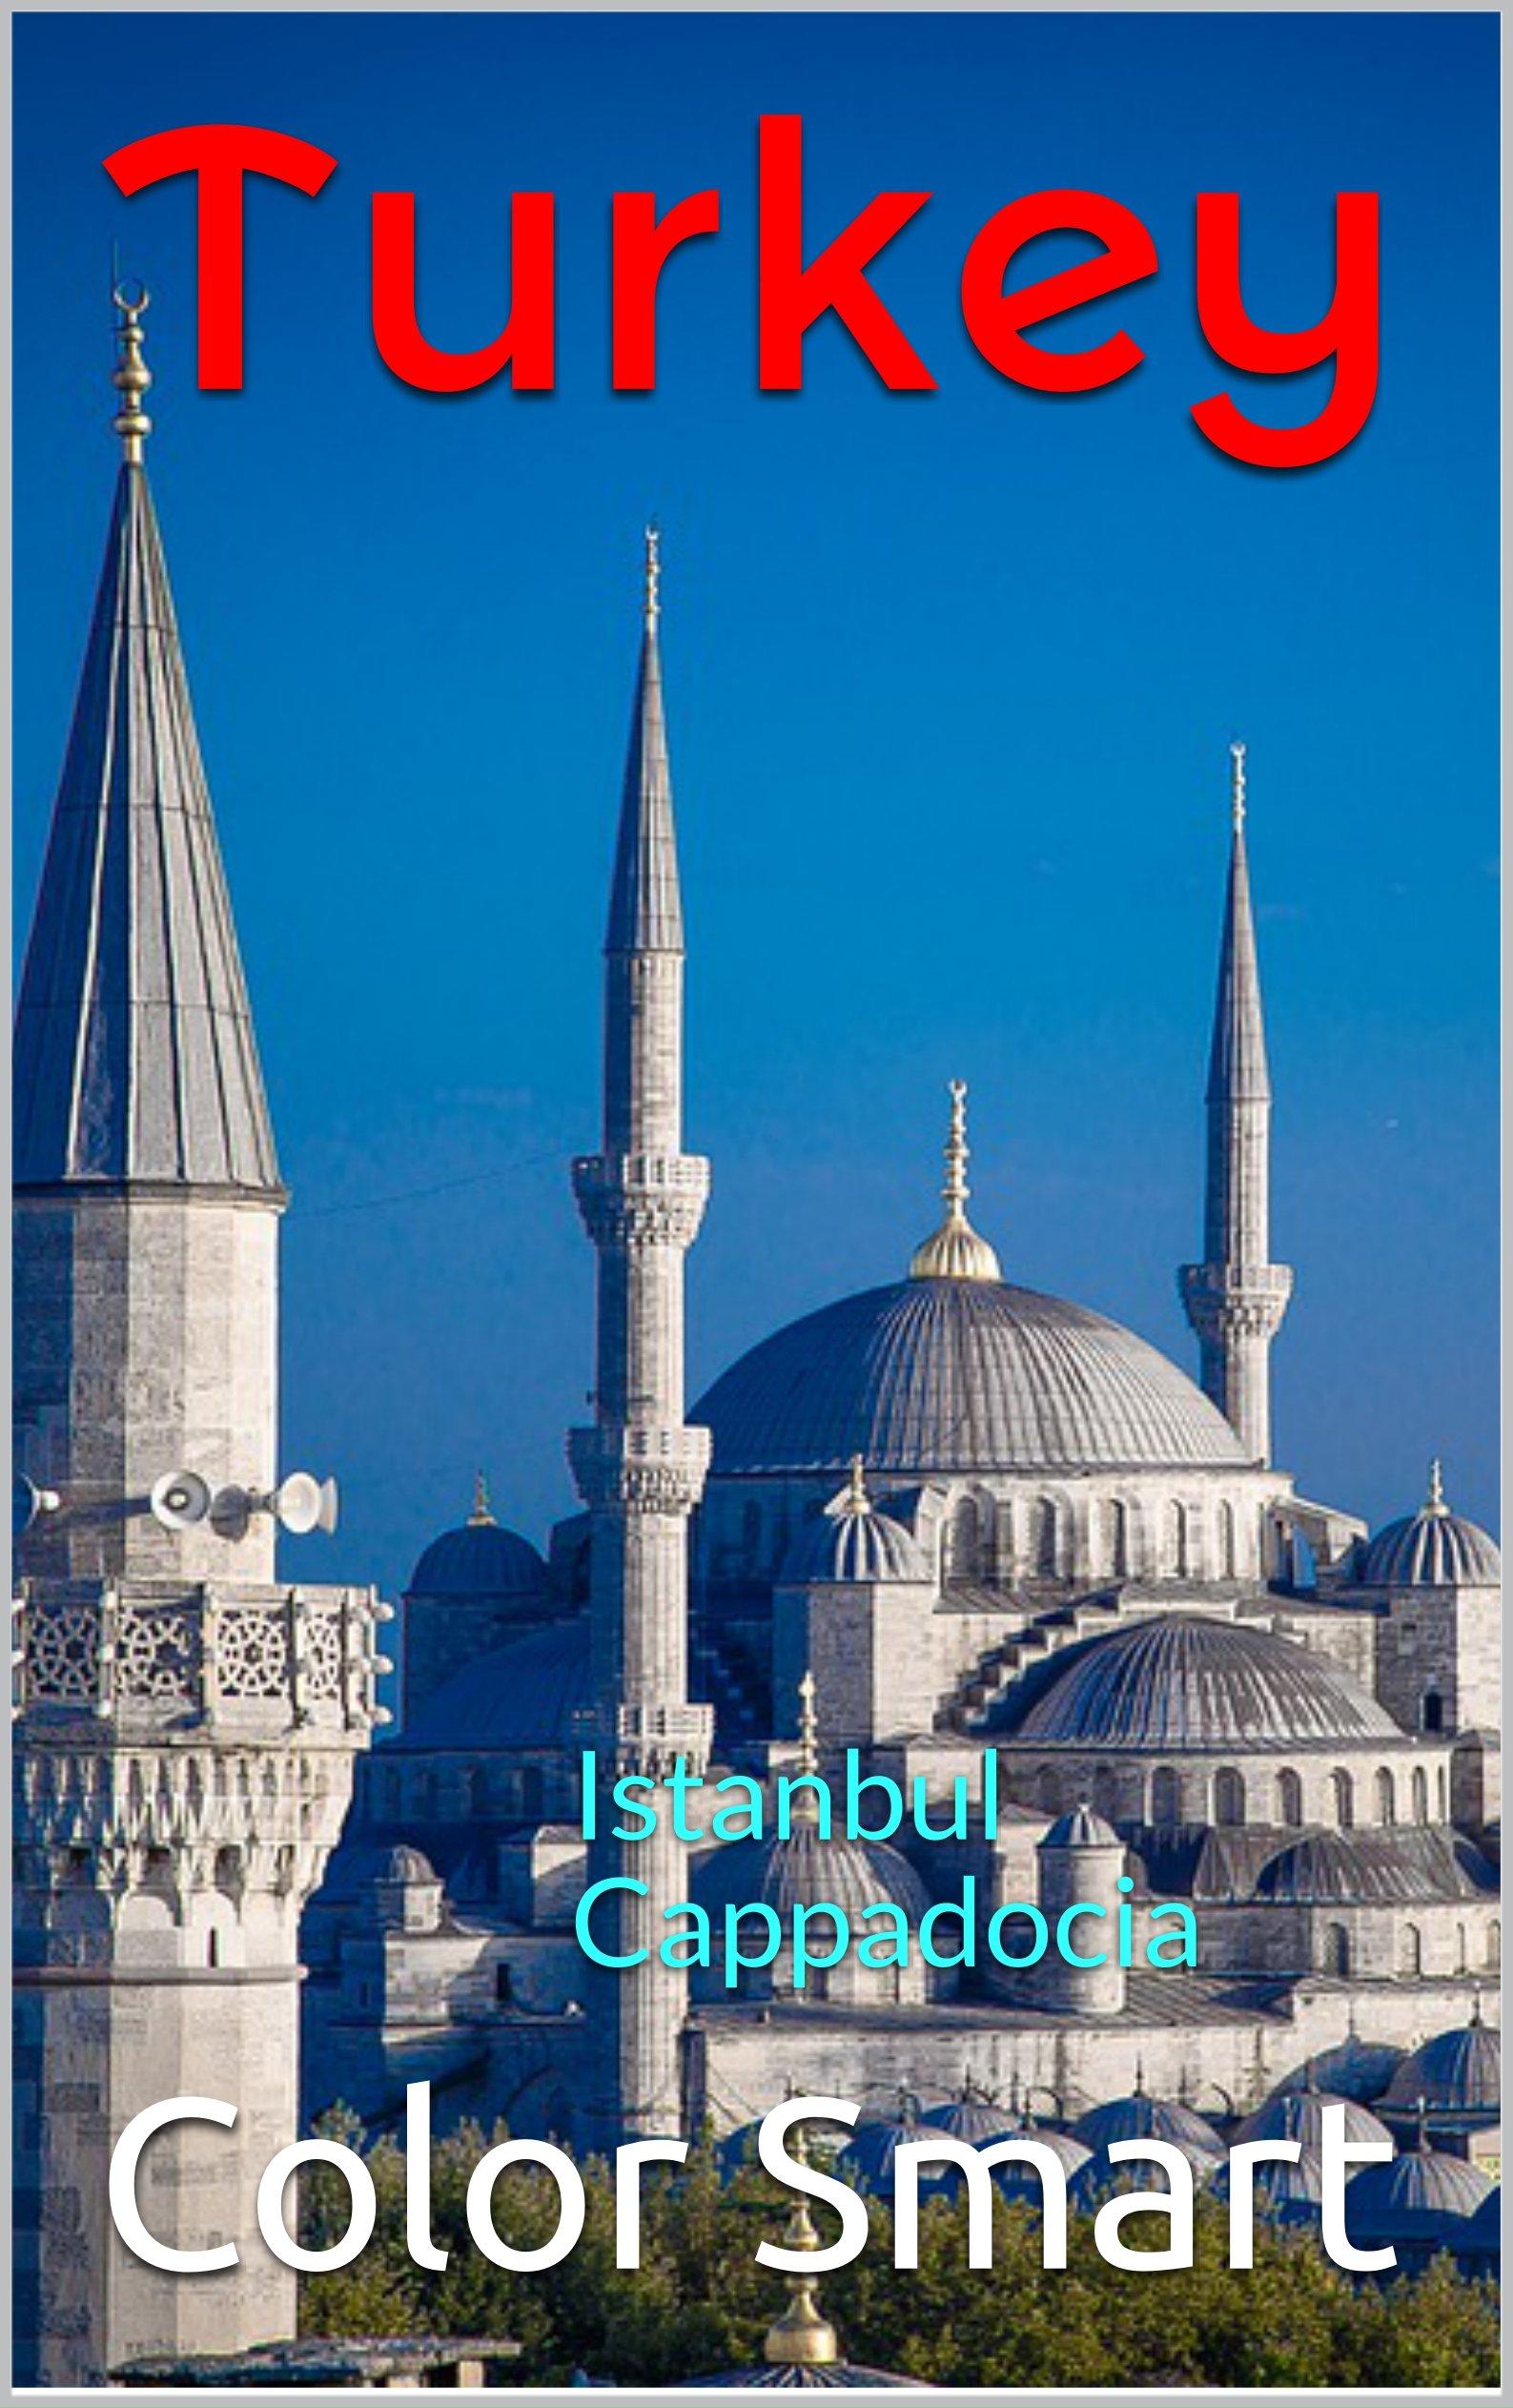 Turkey: Istanbul Cappadocia (Photo Book Book 79)